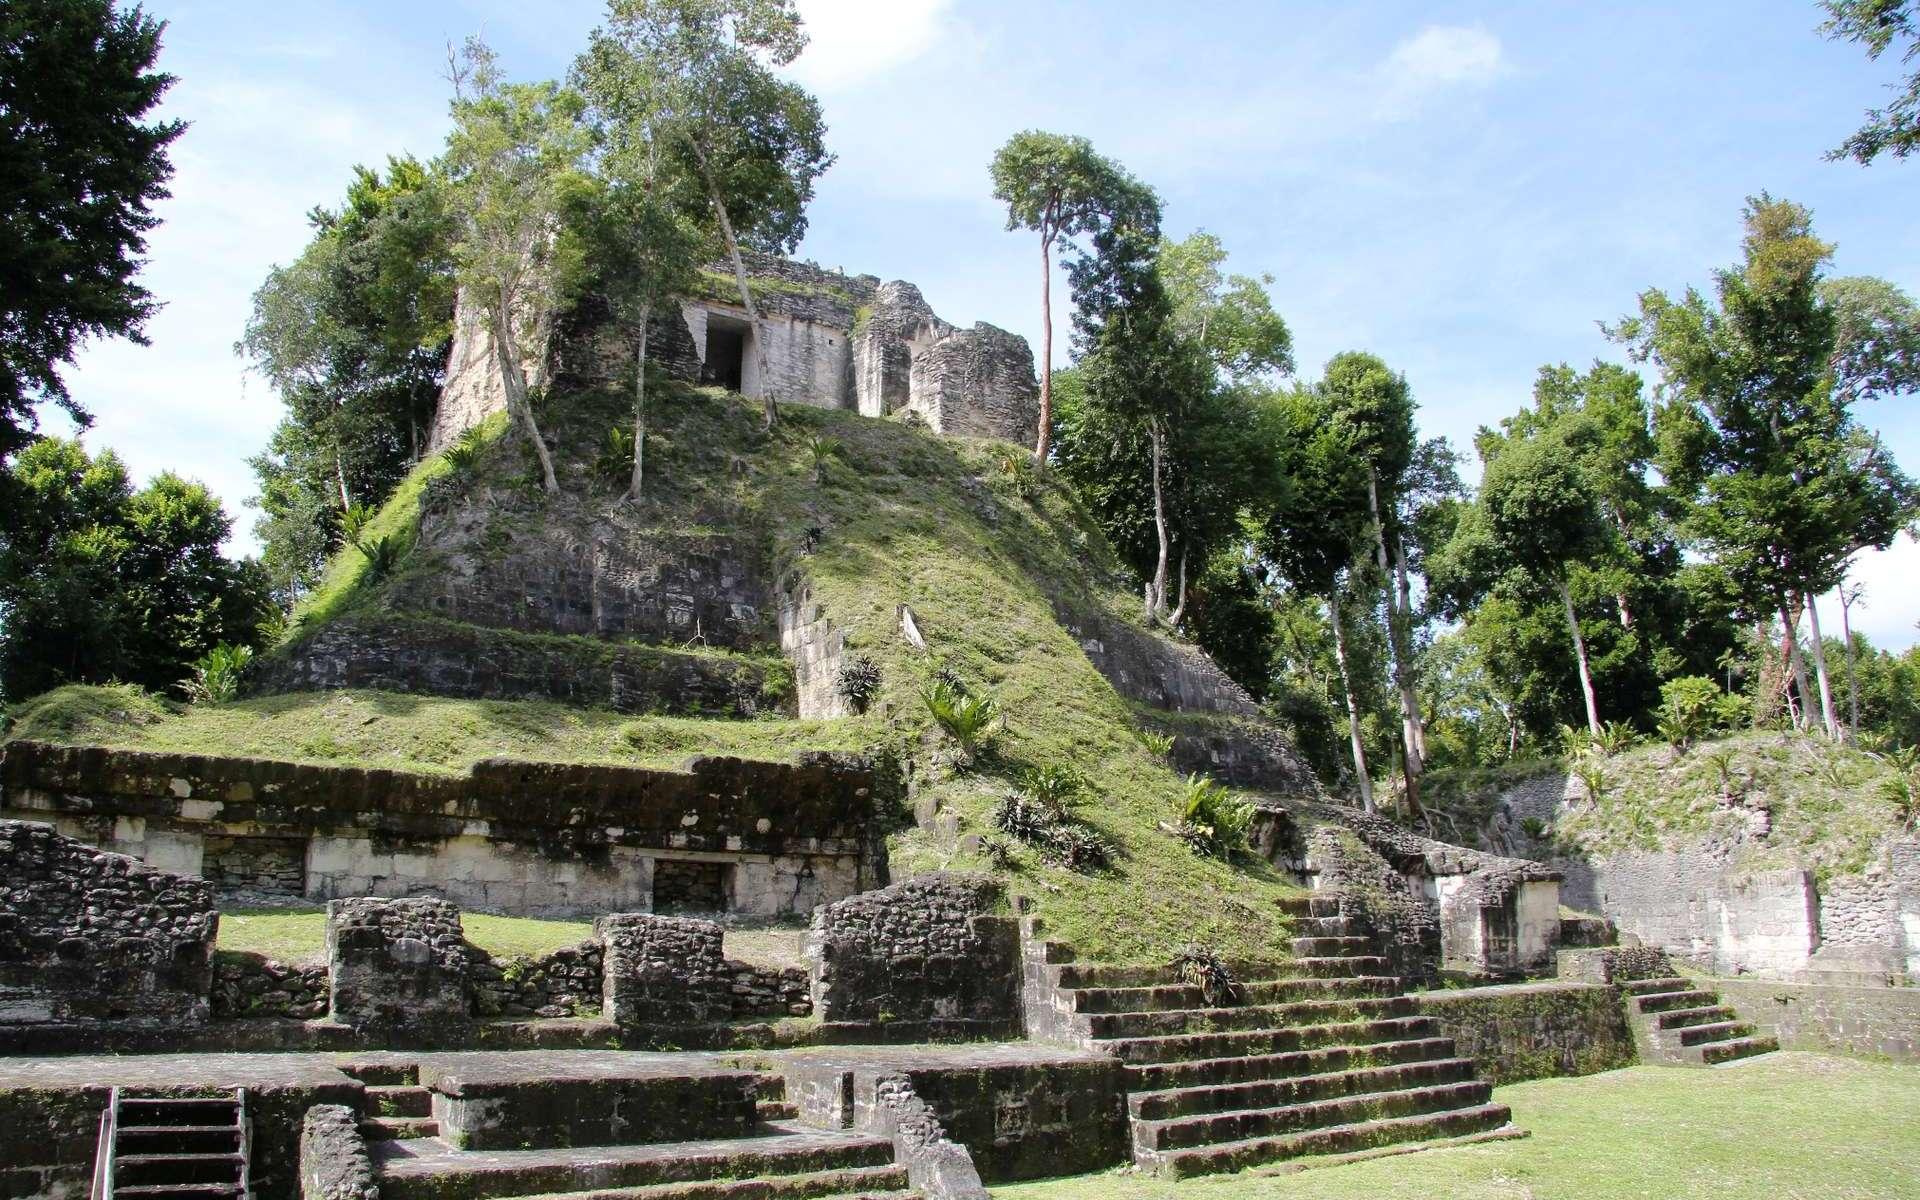 Le temple maya de Nakum au Guatemala. © cc-by-sa-40-jorge-antonio-leoni-de-leon